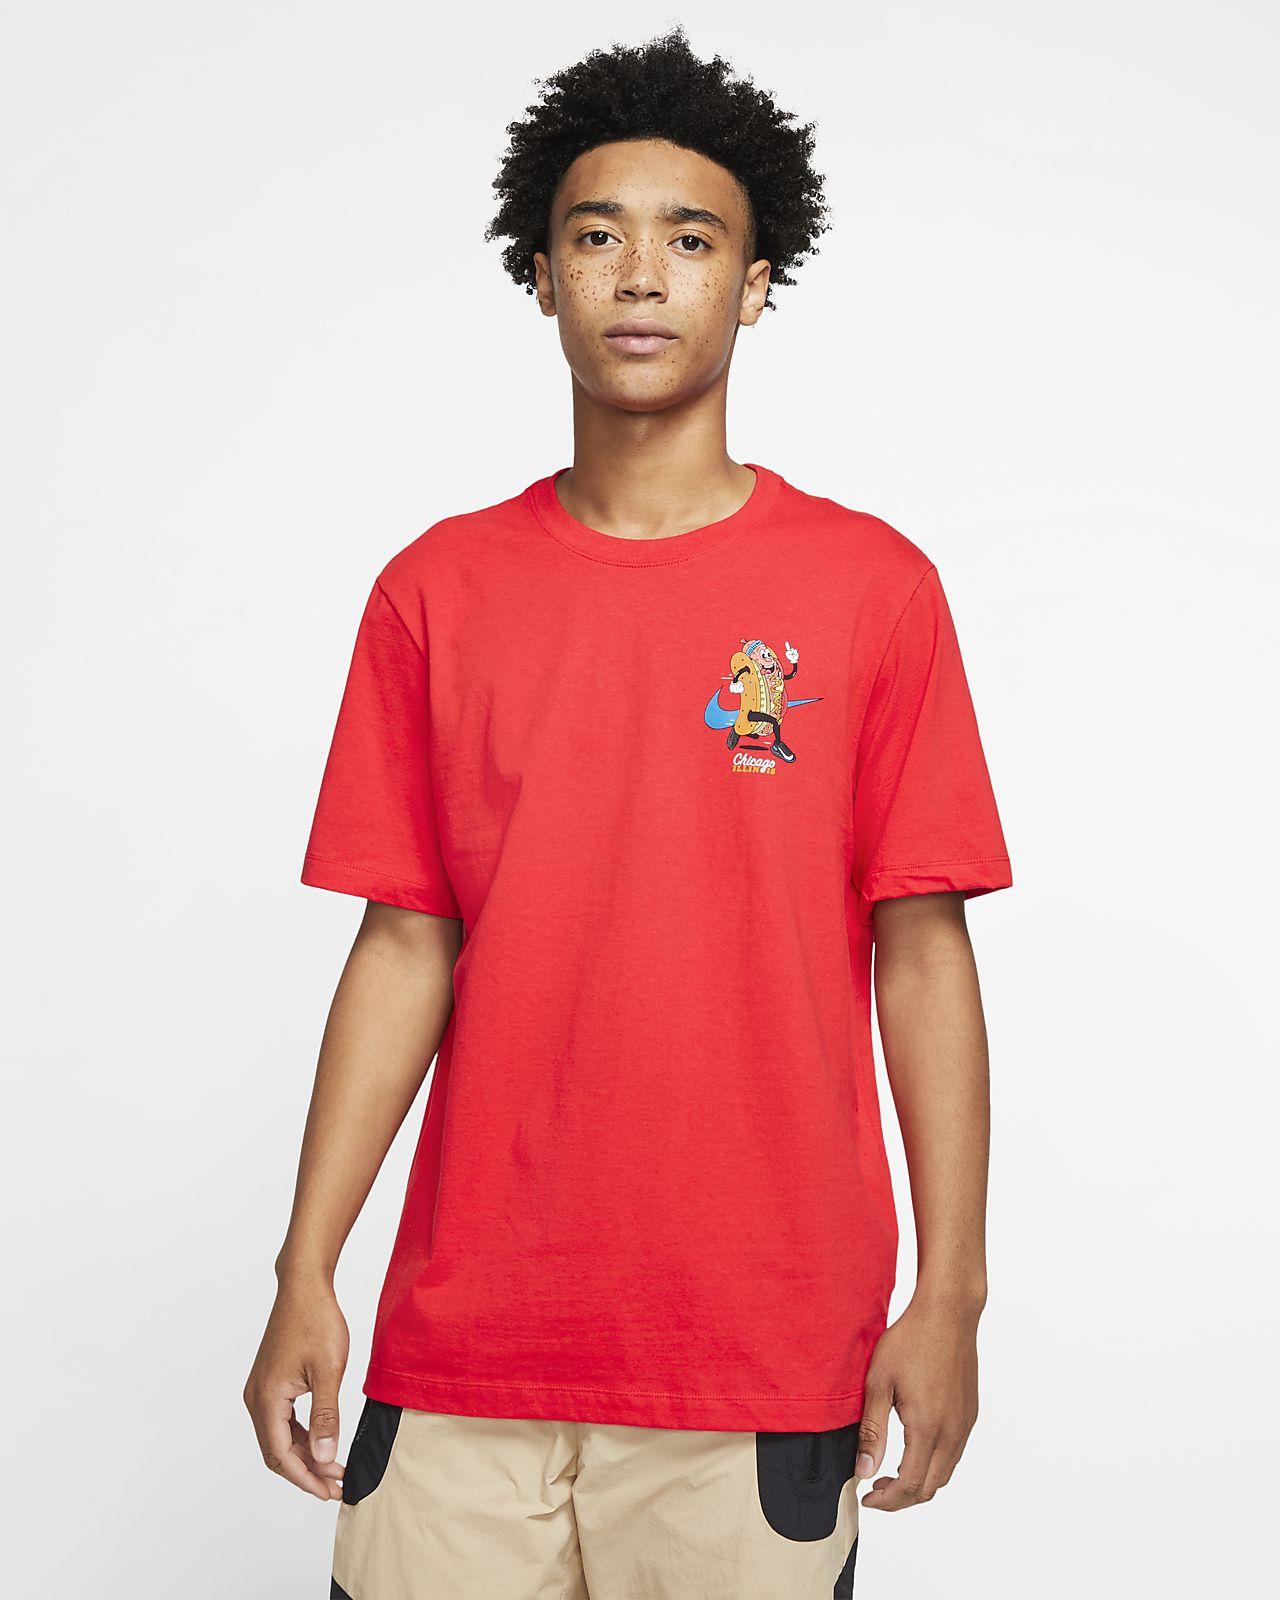 Nike Sportswear Chicago Men's T-Shirt